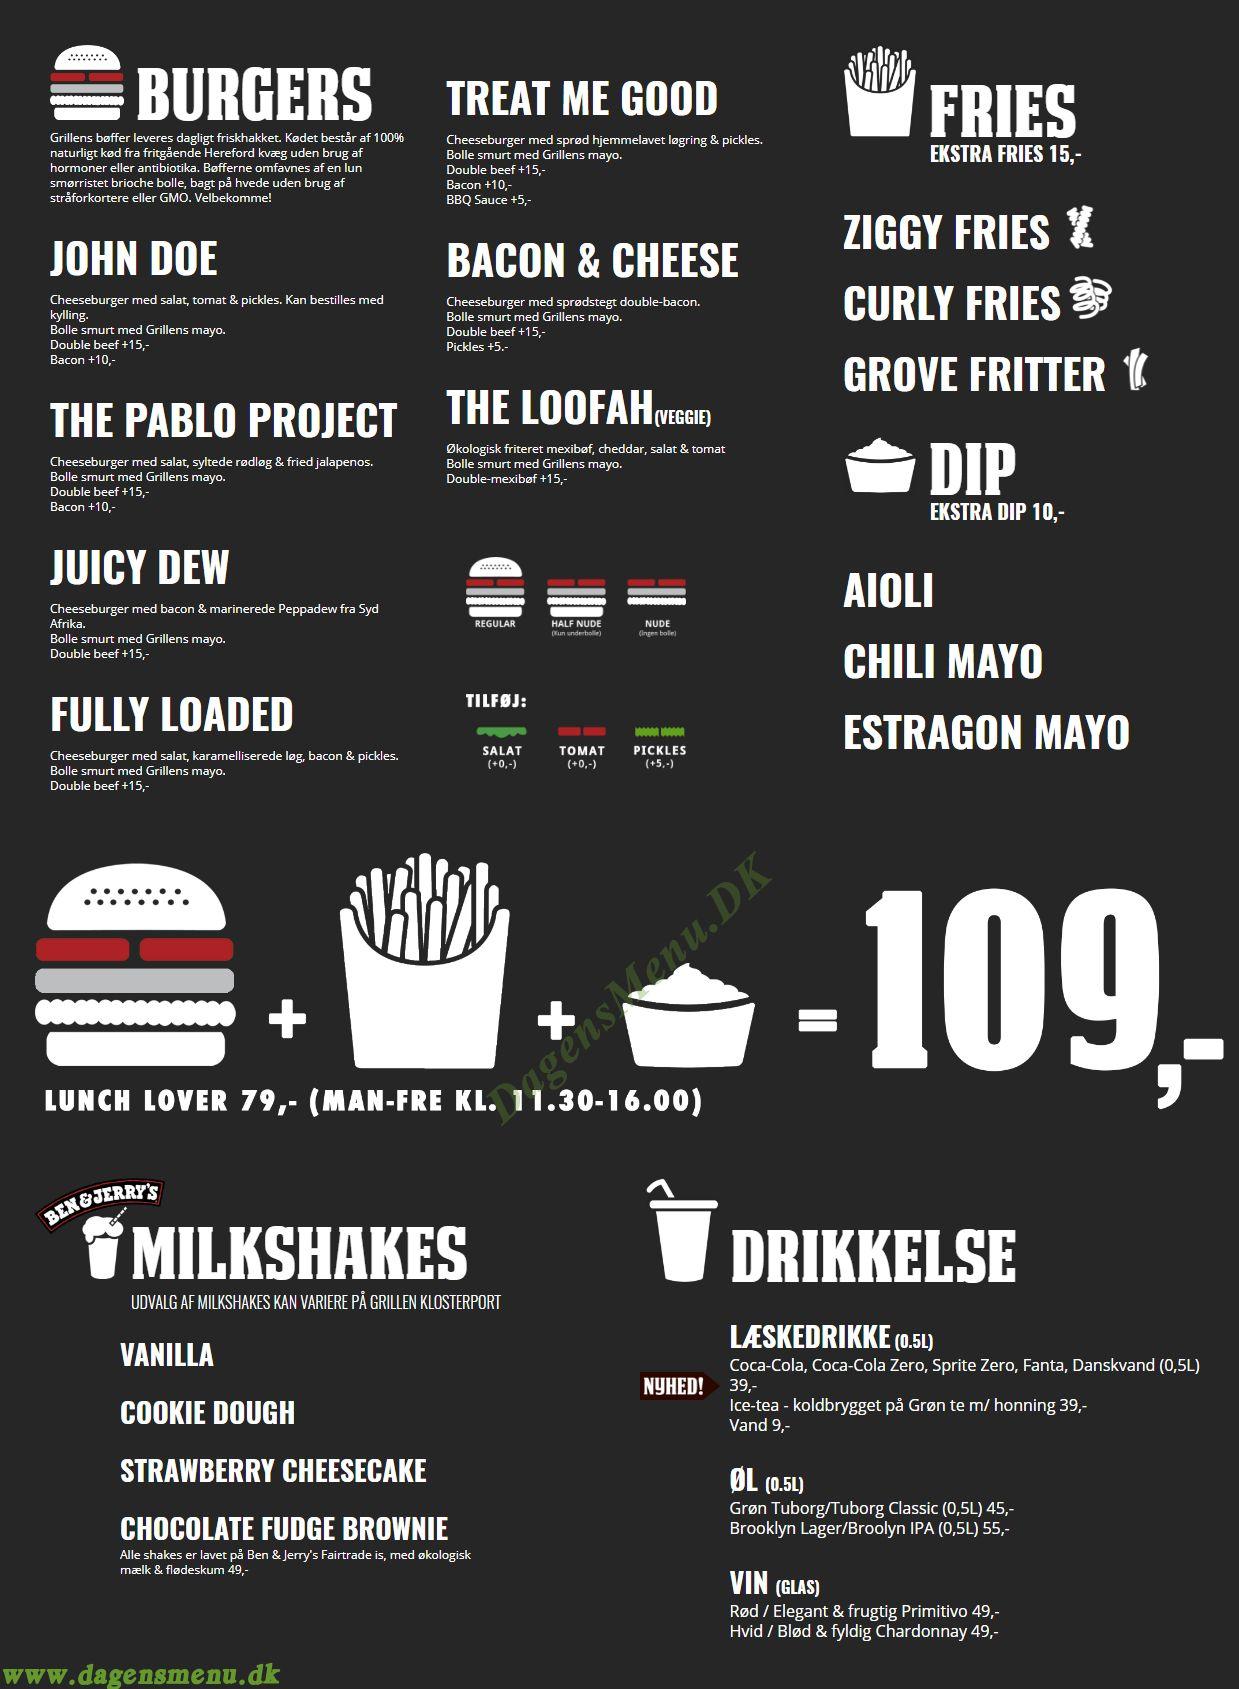 Grillen Burgerbar - Menukort